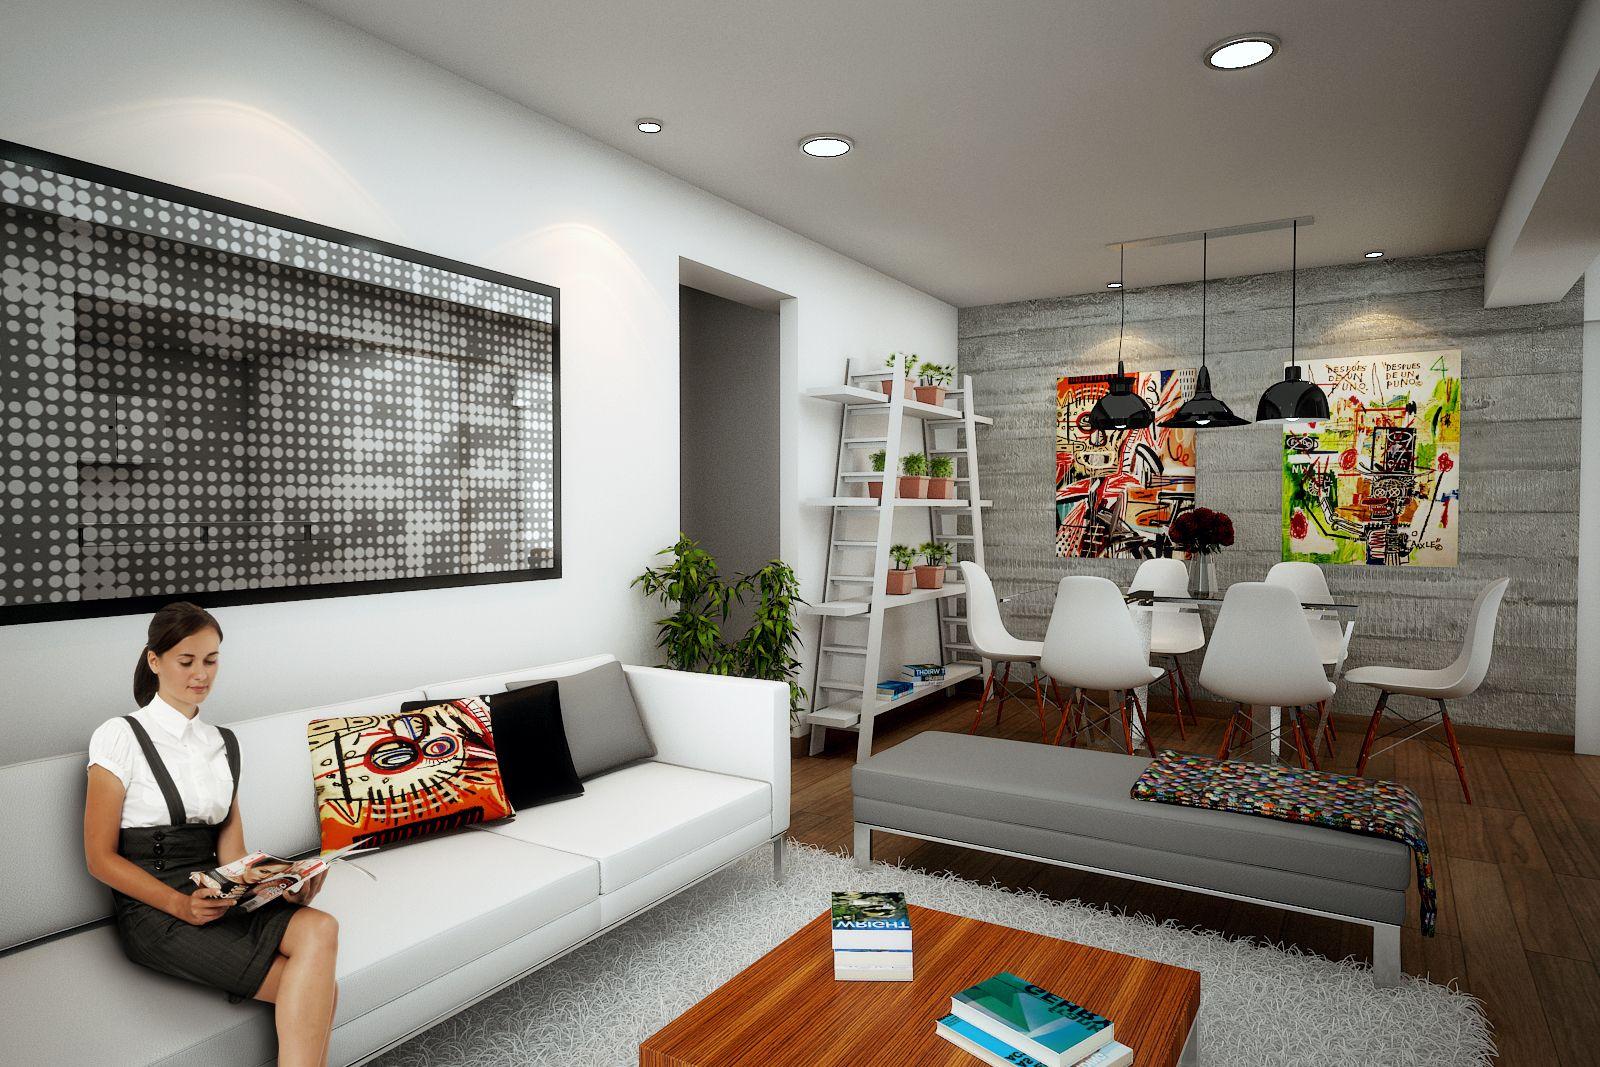 Dise o interior para la sala comedor del departamento for Diseno interior departamento